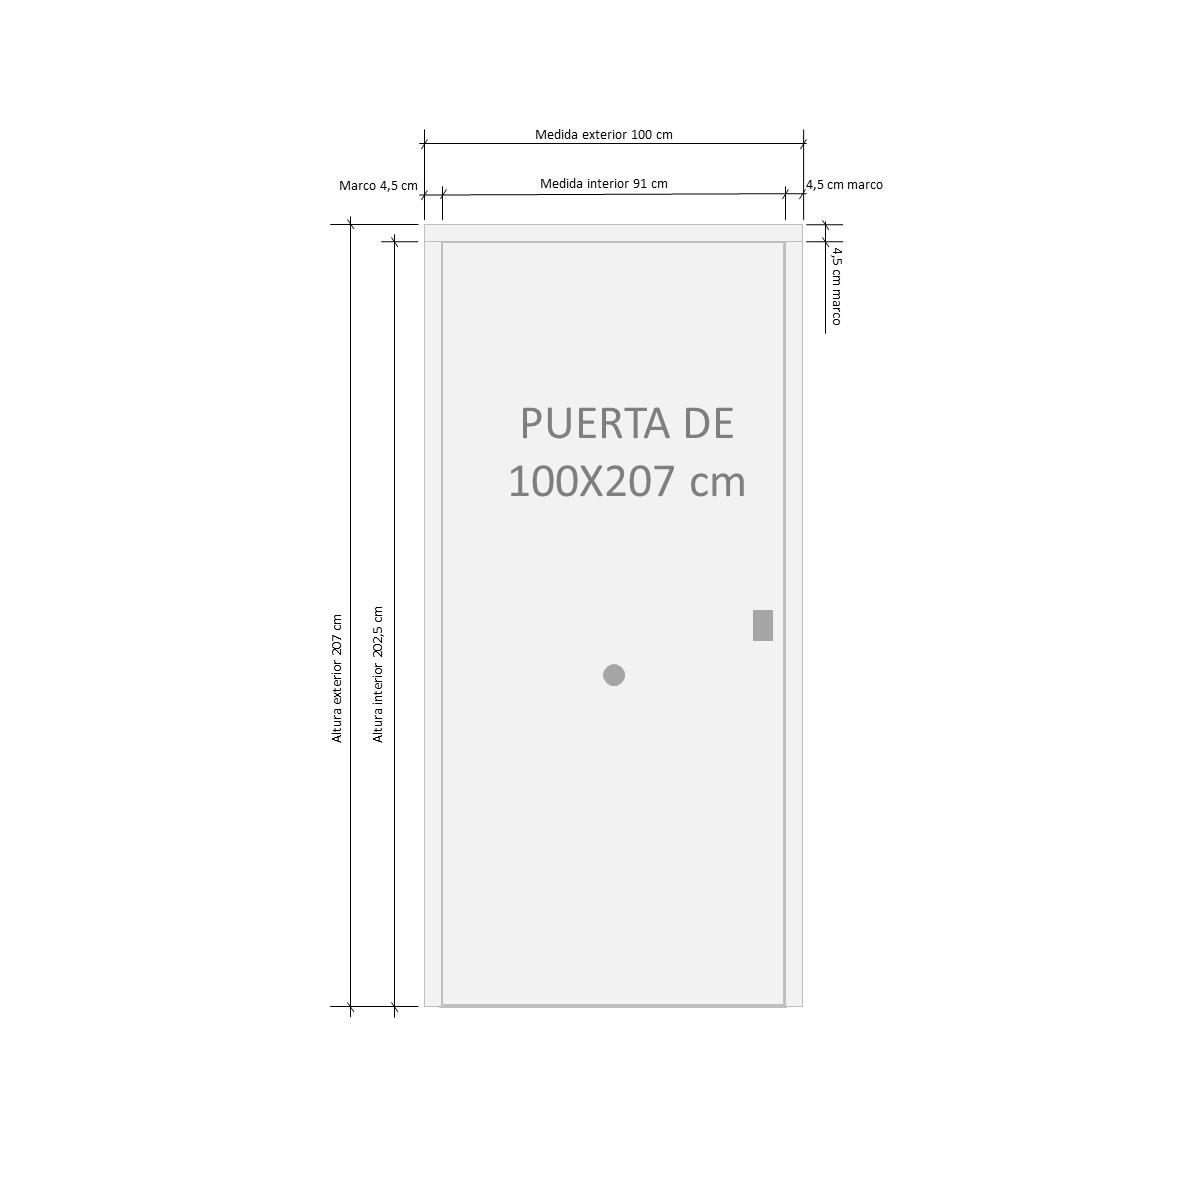 Puerta acorazada Antique Cearco Puertas acorazadas Serie B4-BL